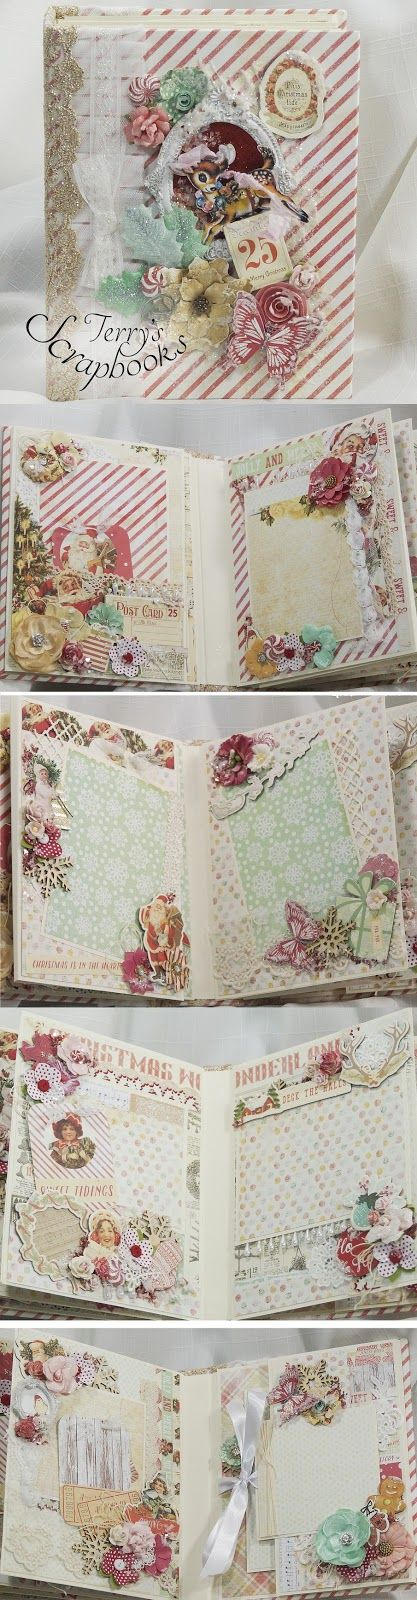 CUTE Sweet Peppermint book>>>Terry's Scrapbooks